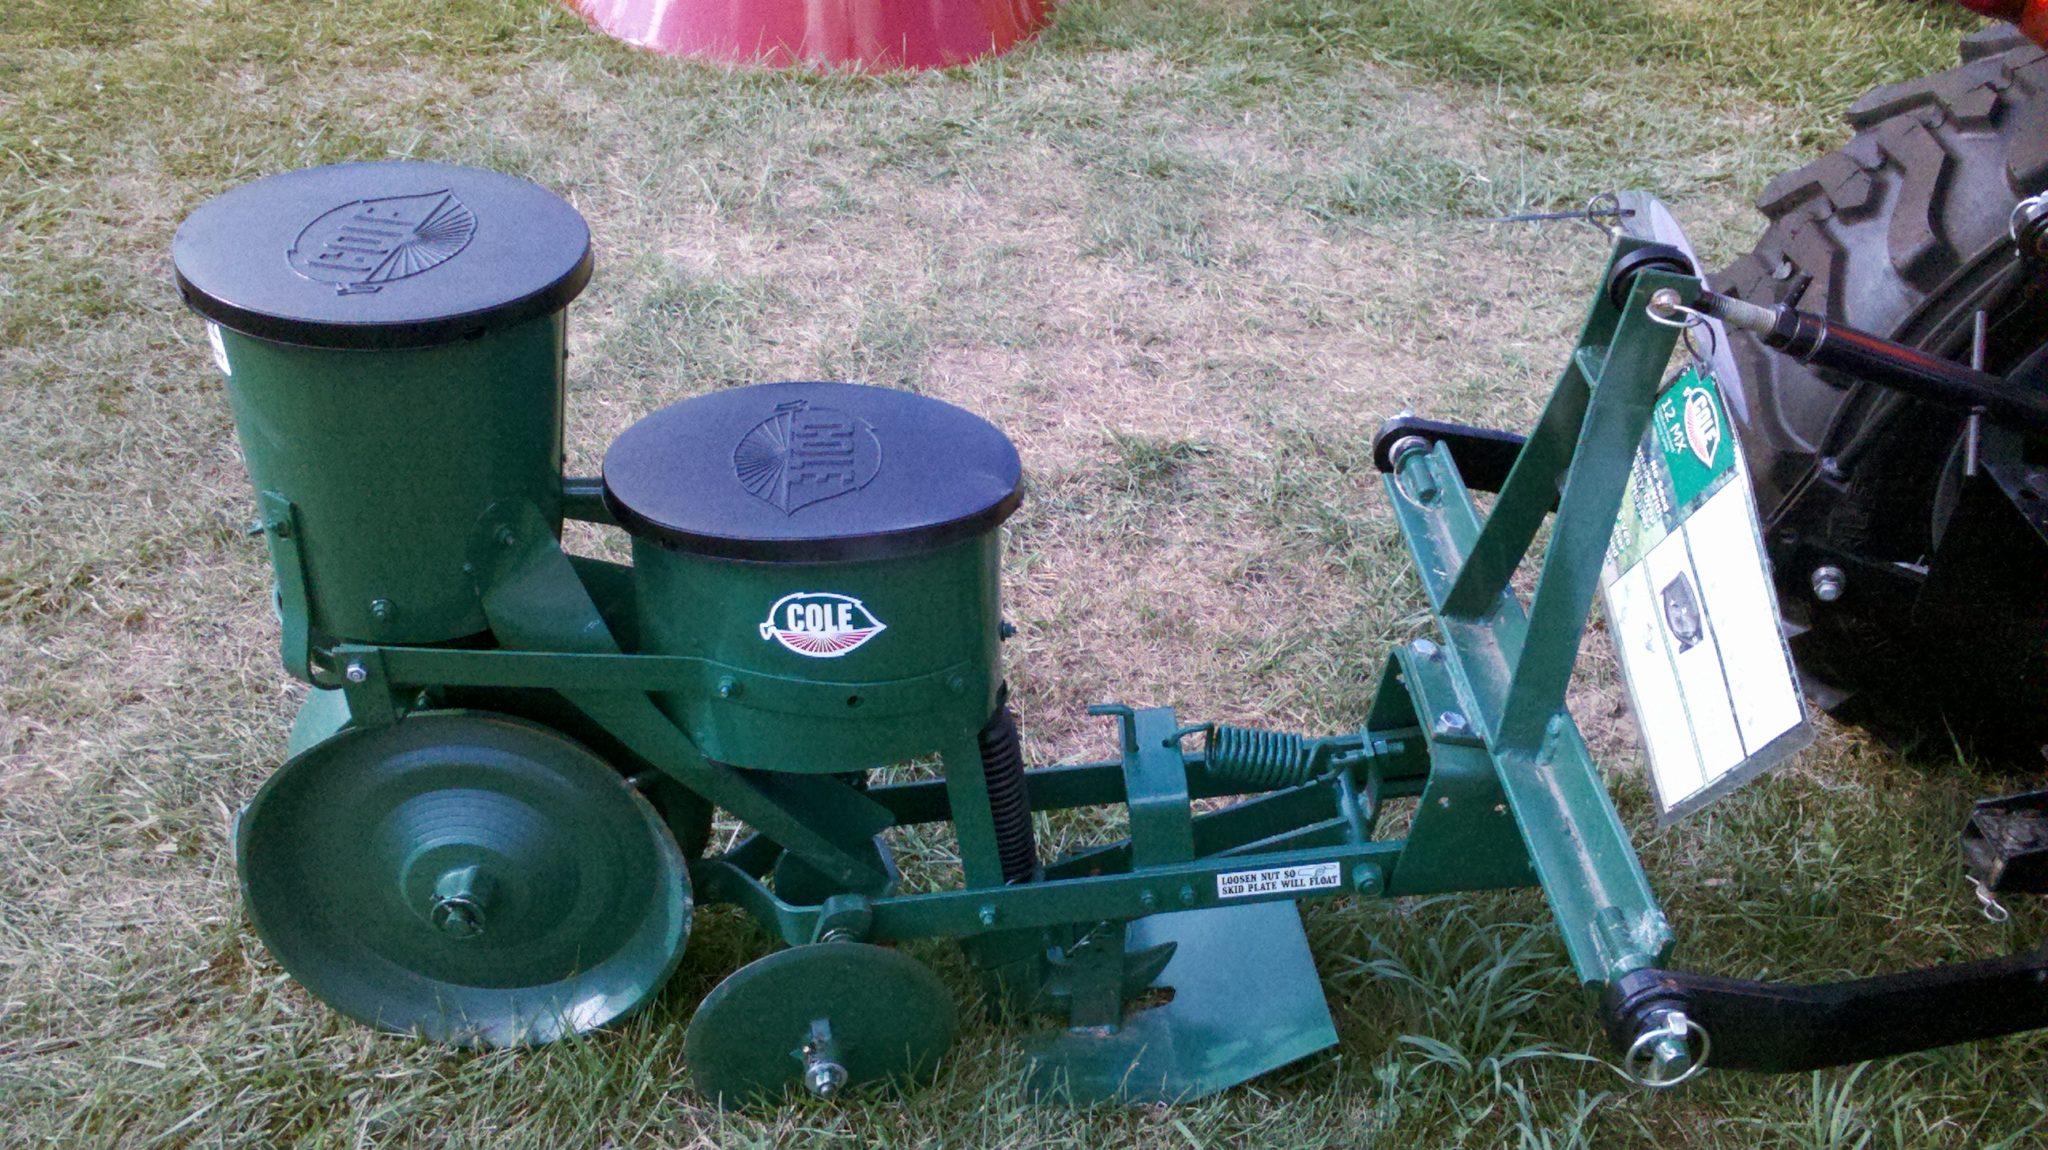 012-0101 Cole 12MX Planter w/Fertilizer Hopper w/ Cat I Hitch